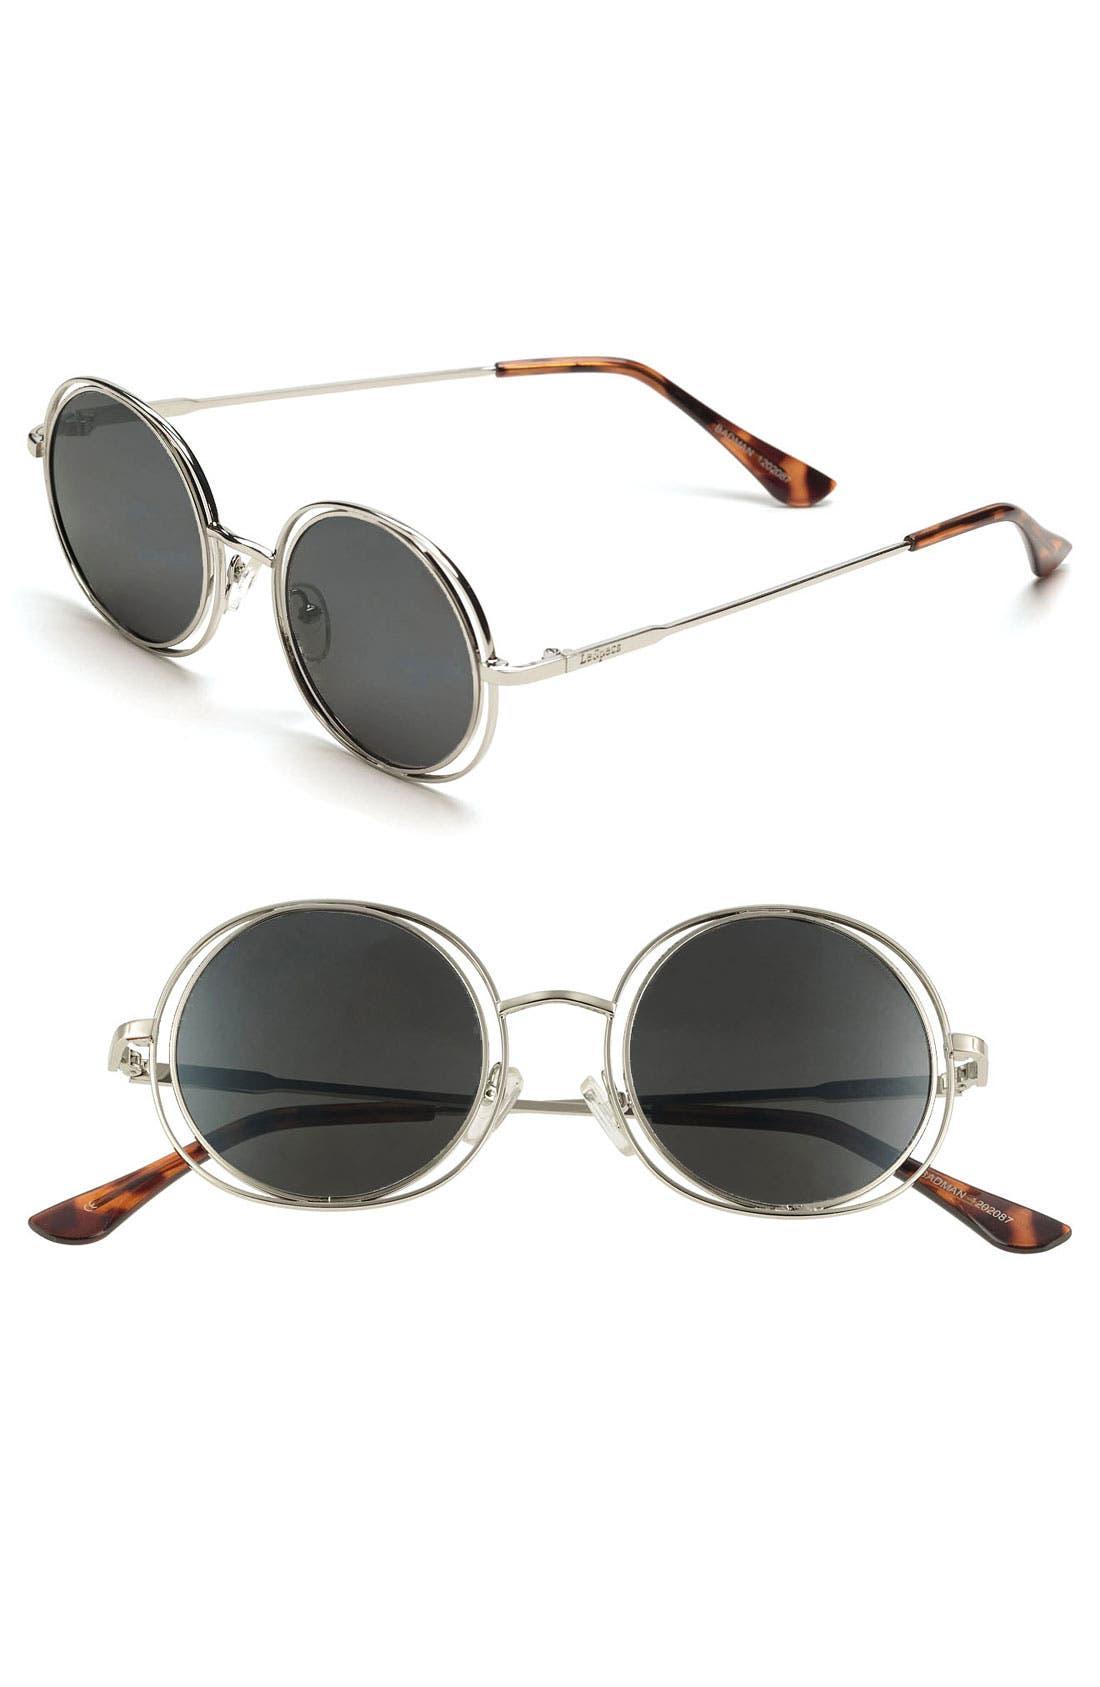 Main Image - Le Specs 'Badman' Sunglasses